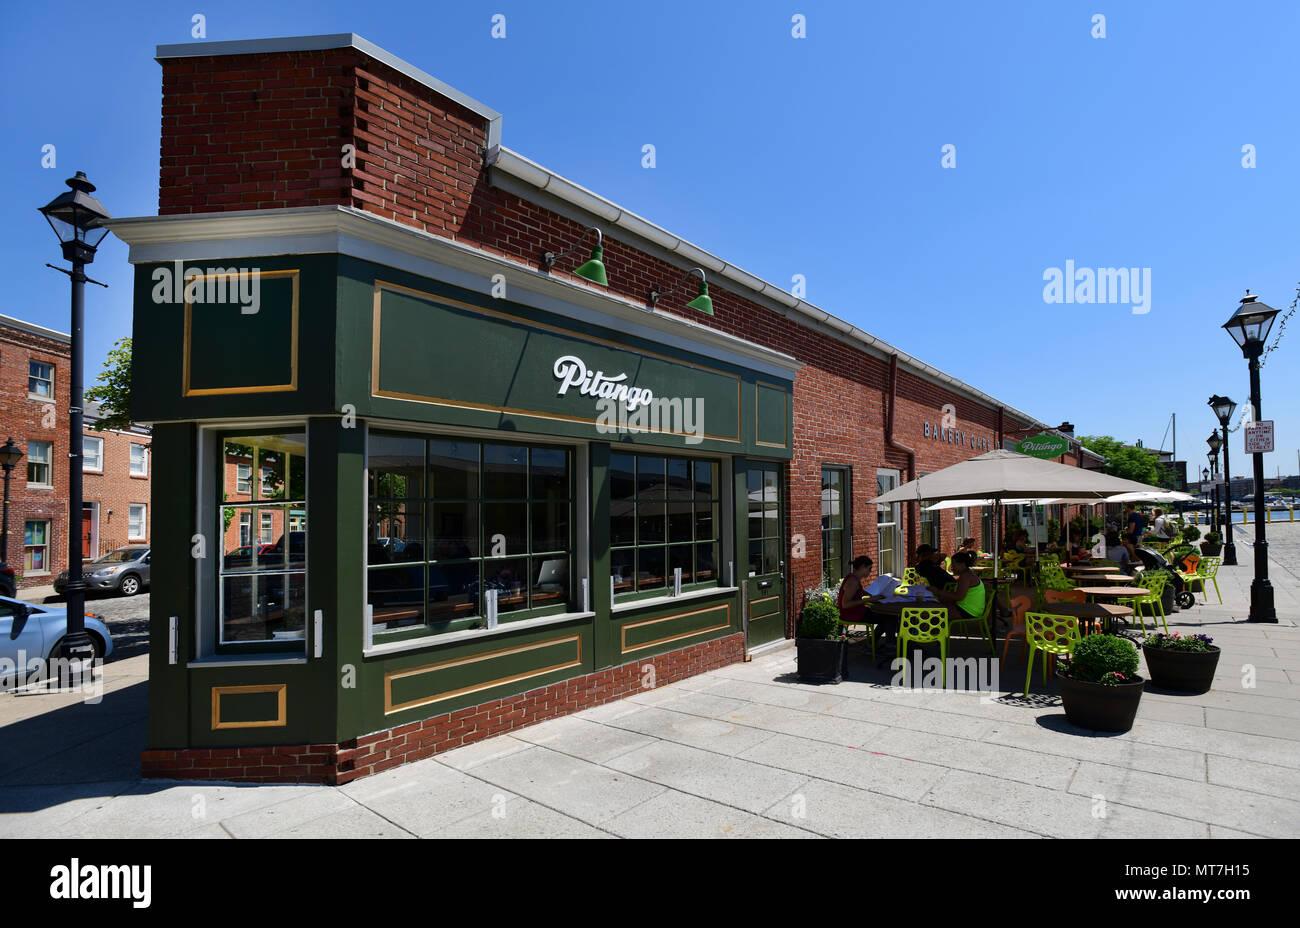 USA Maryland MD Baltimore Fells Point Pitango Bakery Cafe restaurant coffee shop - Stock Image